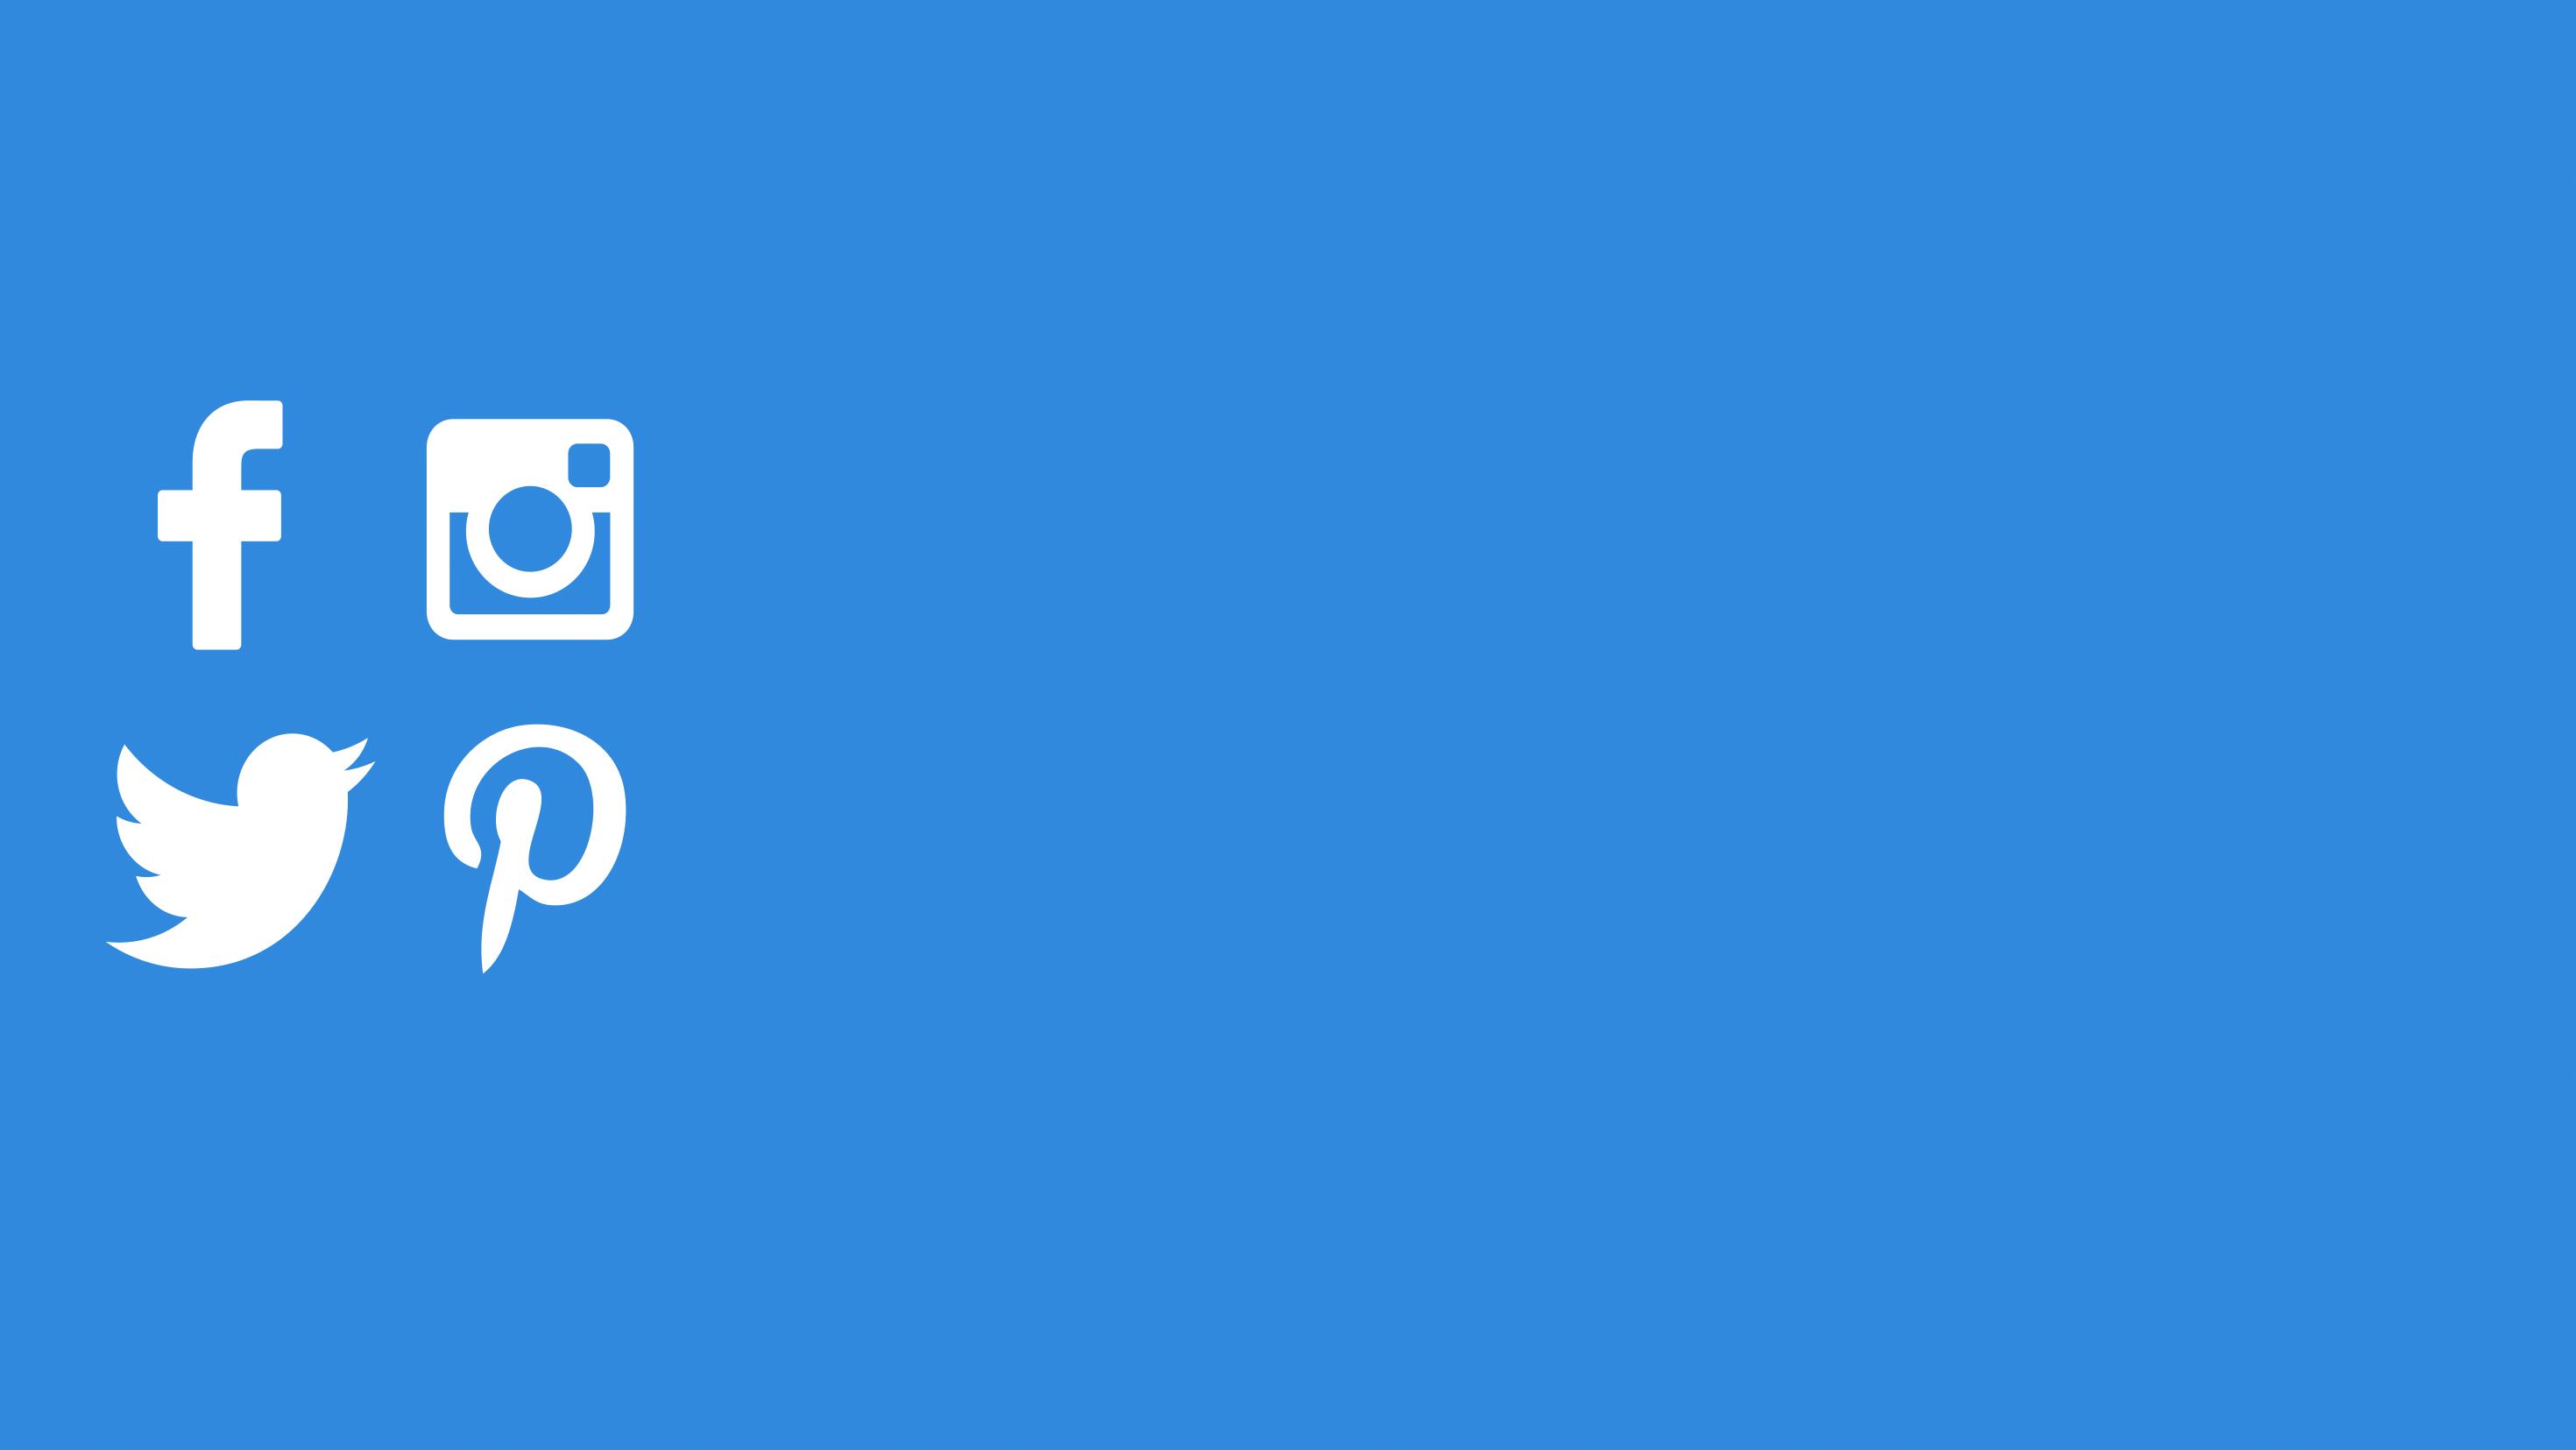 Blog+social+media+icons+banner